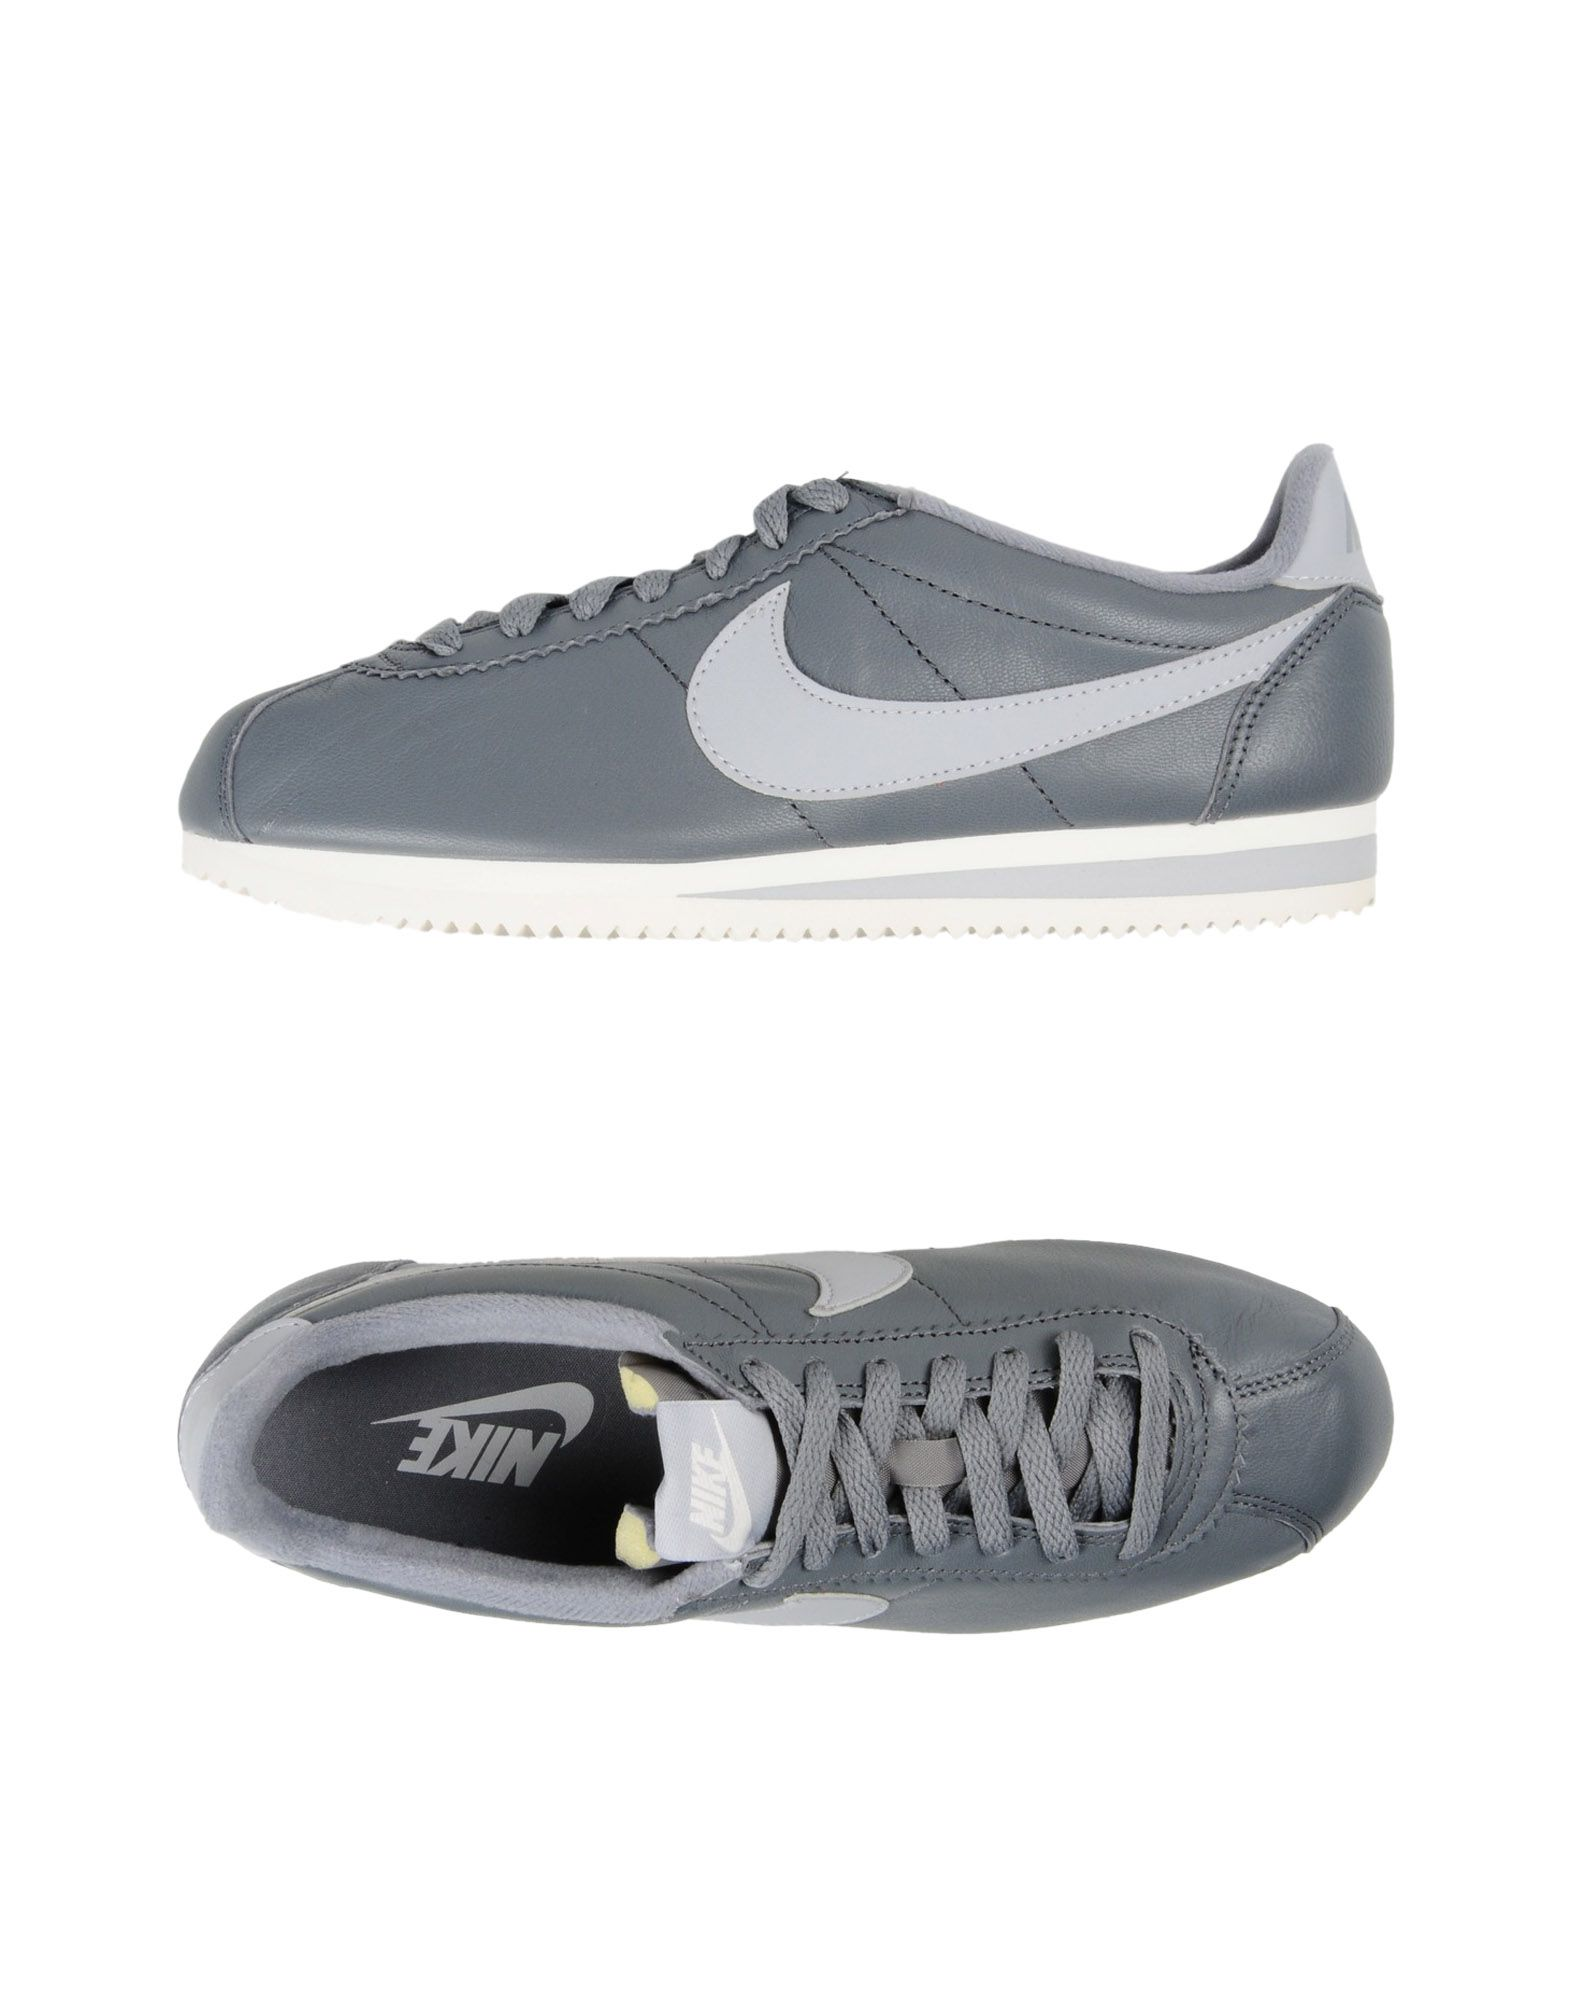 Nike  Classic Cortez Leather Premium  11105733CK Gute Qualität beliebte Schuhe